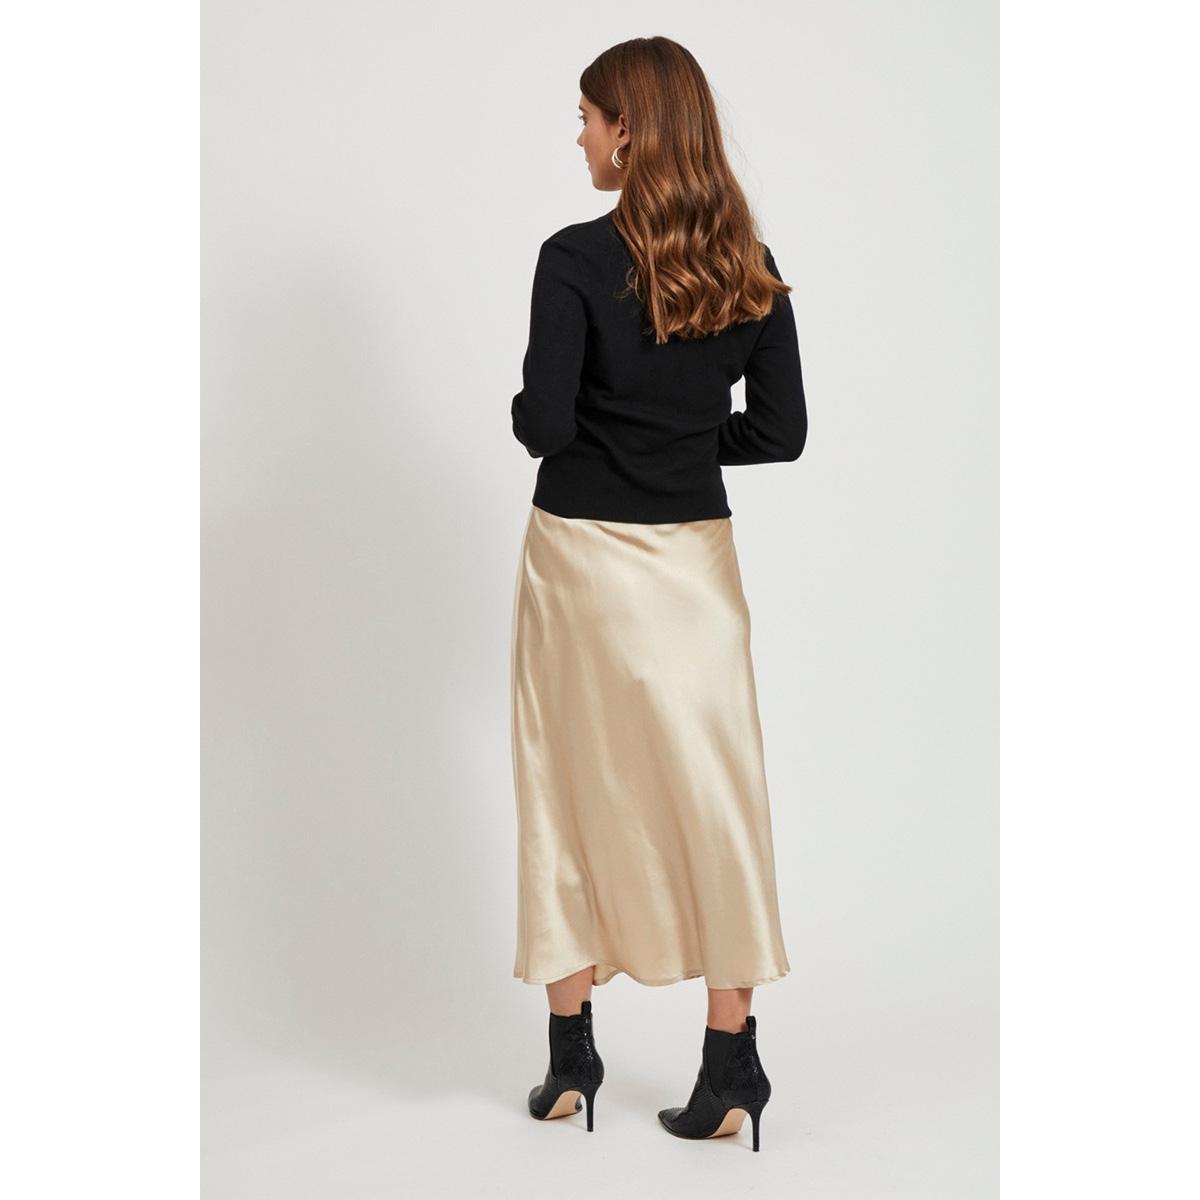 objnina l/s short knit cardigan noo 23031375 object vest black